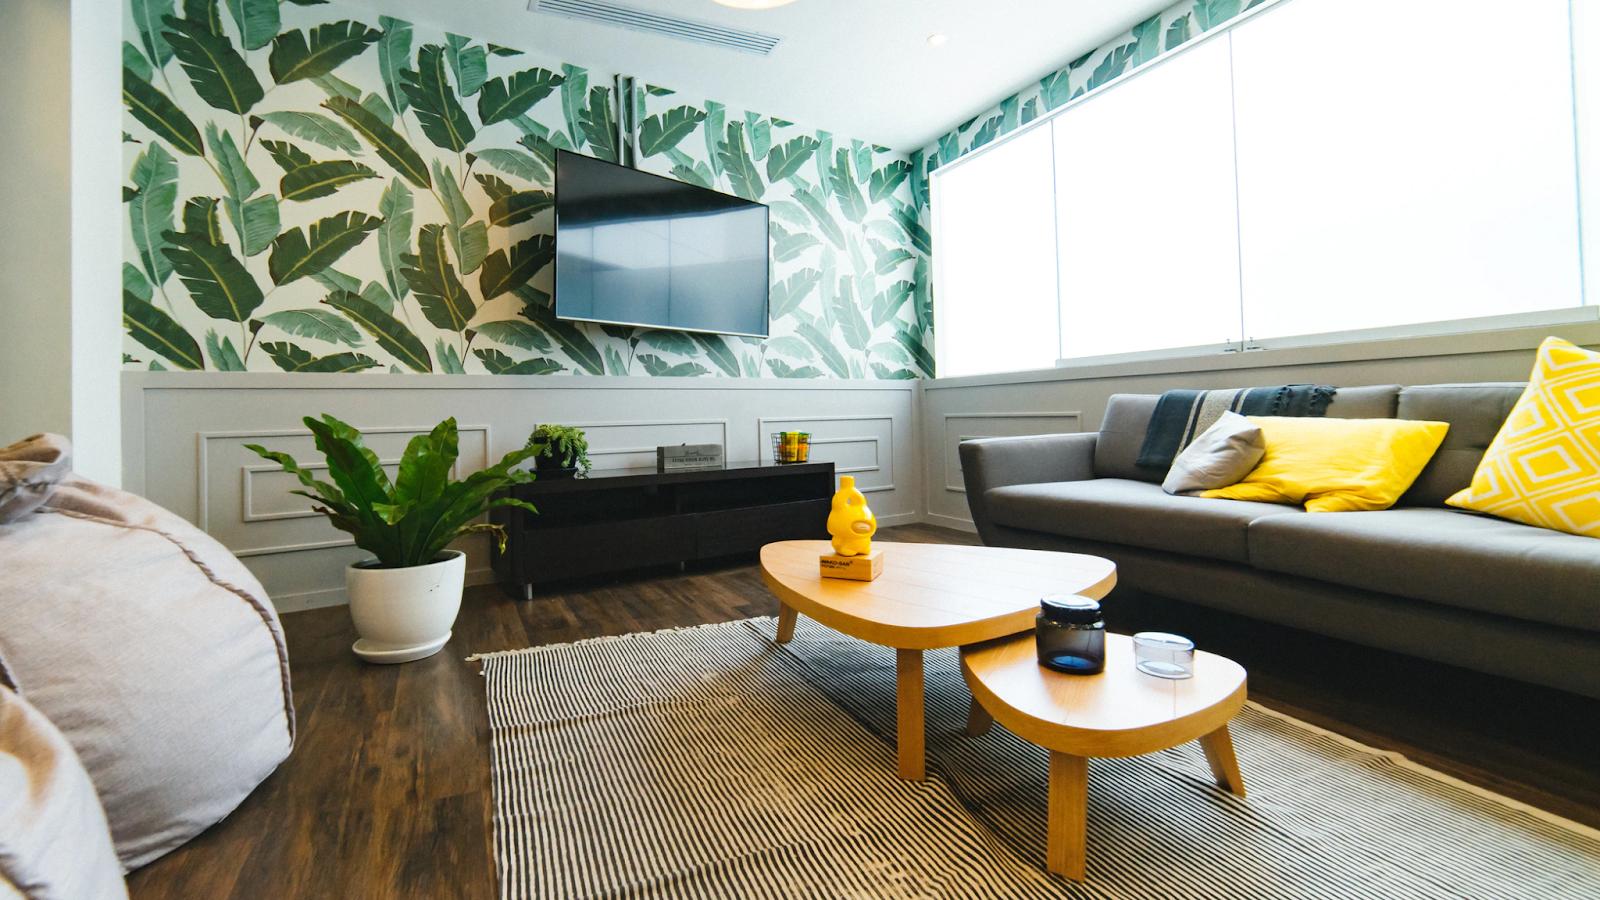 wallpaper to modernize decor